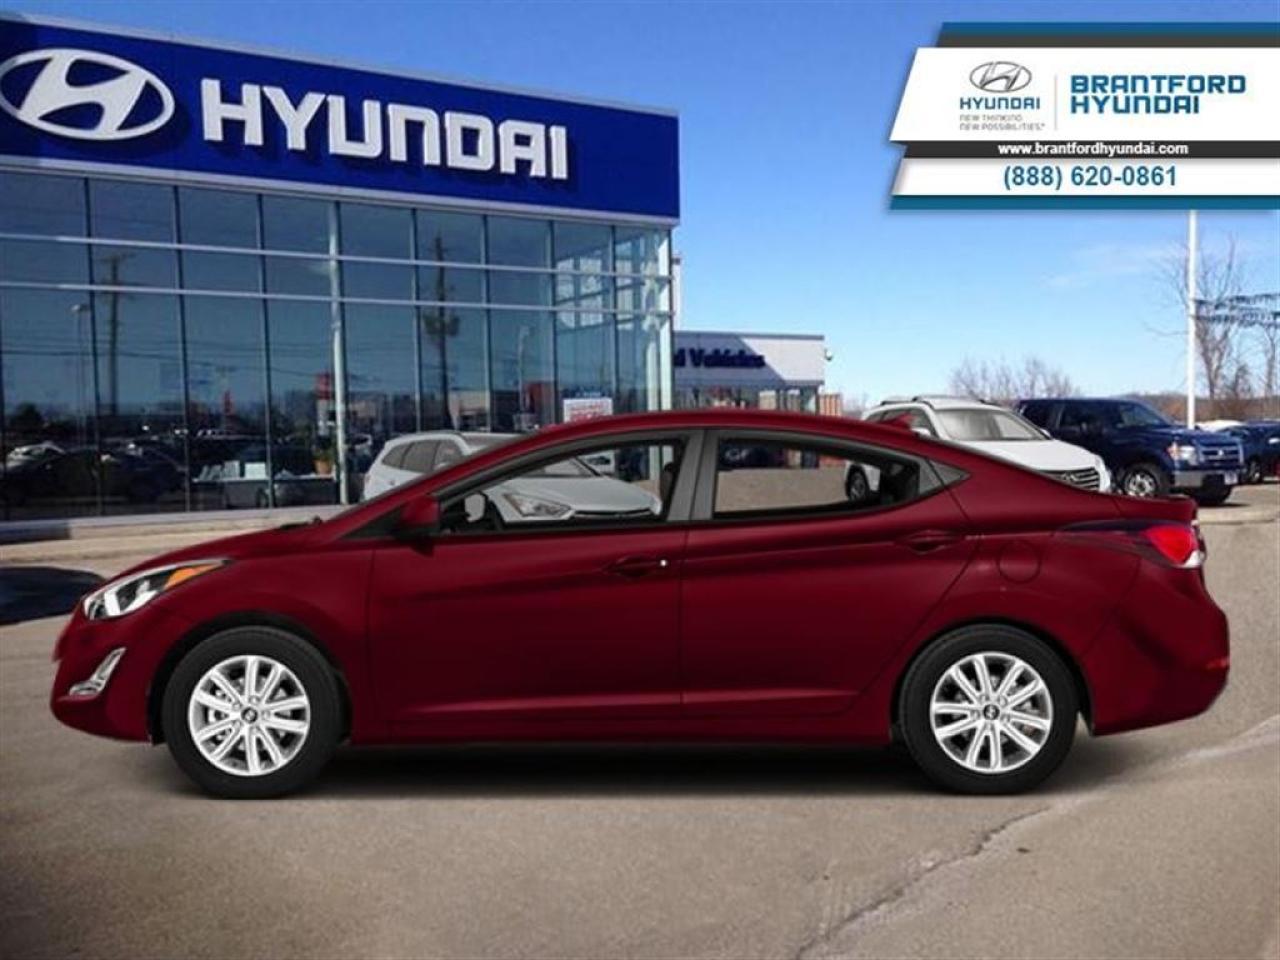 Photo of Red 2014 Hyundai Elantra